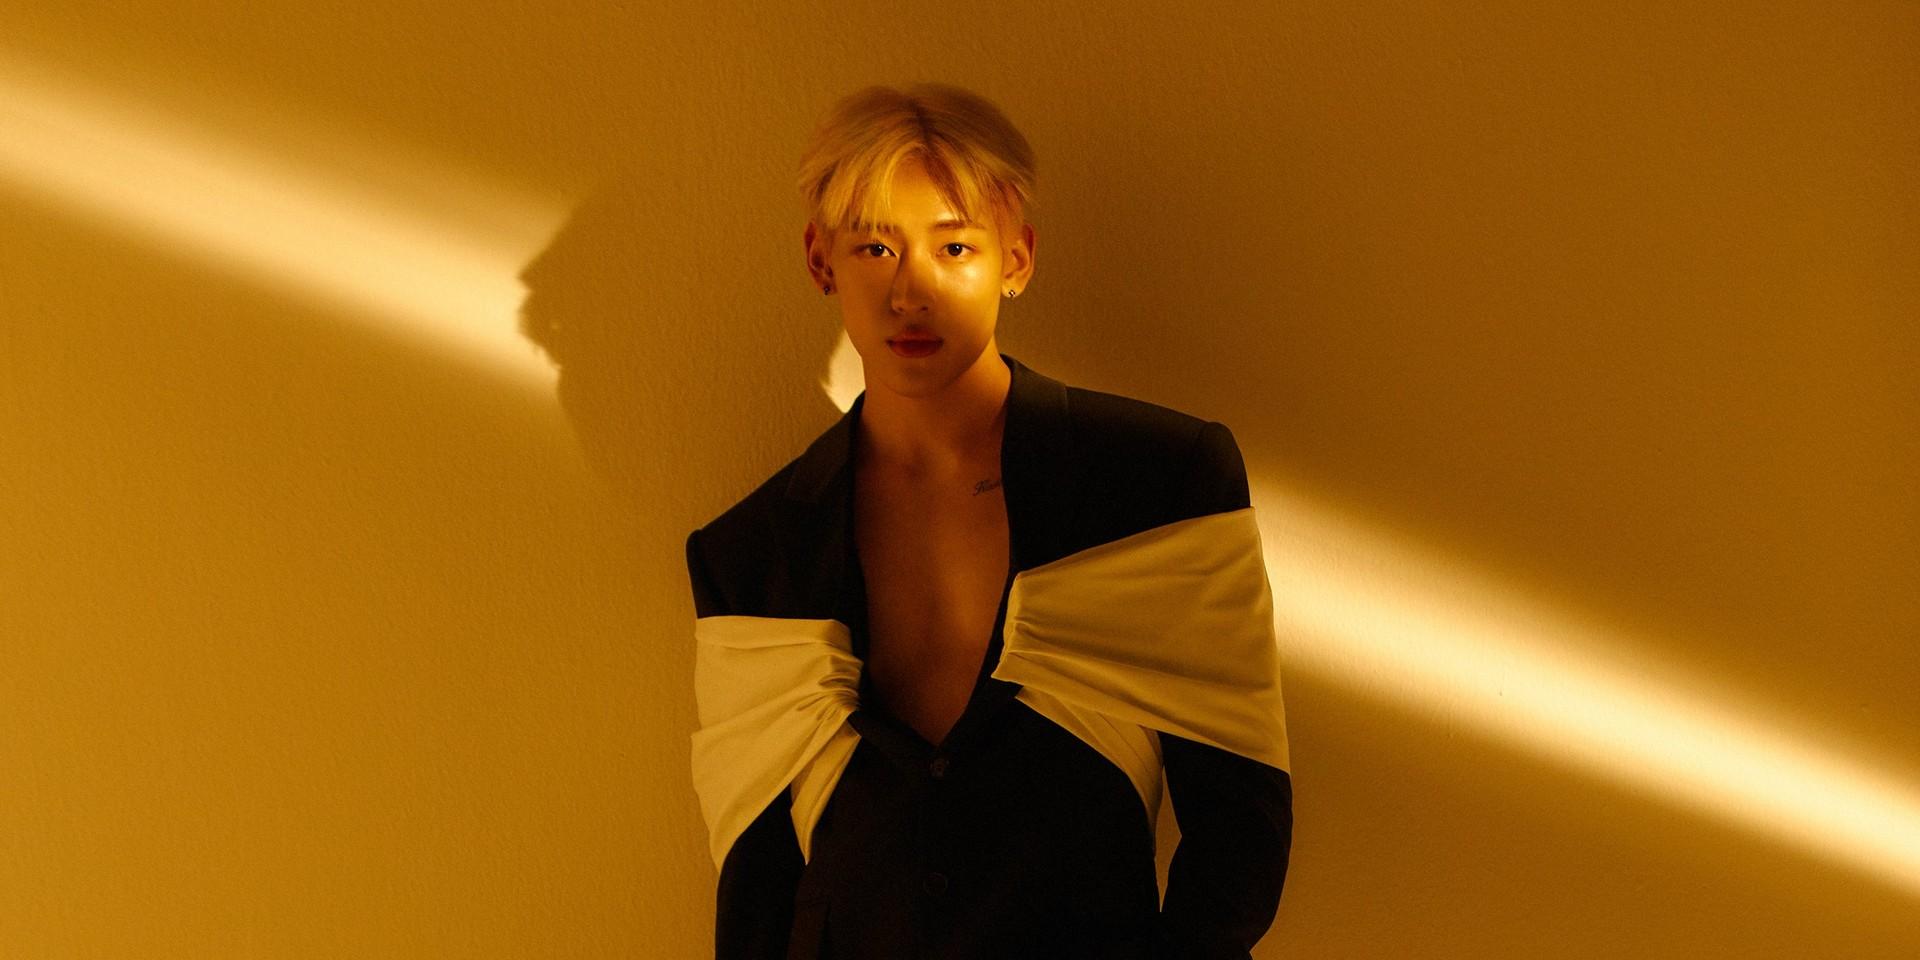 GOT7's BAMBAM announces first solo mini-album, 'riBBon'